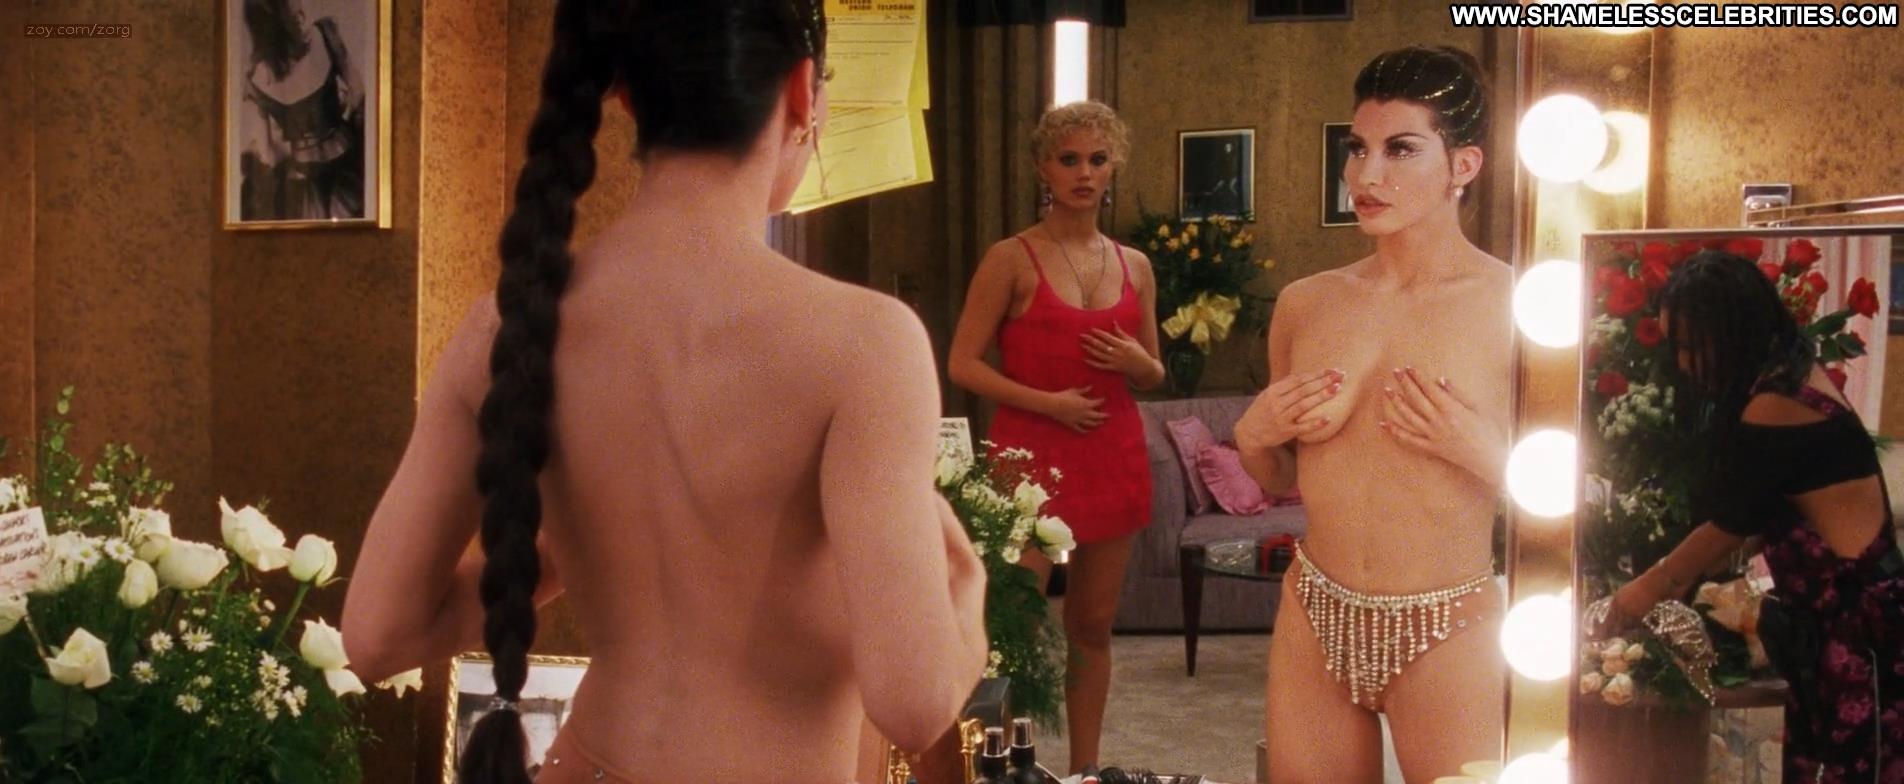 jennifer lesbian scene tilly